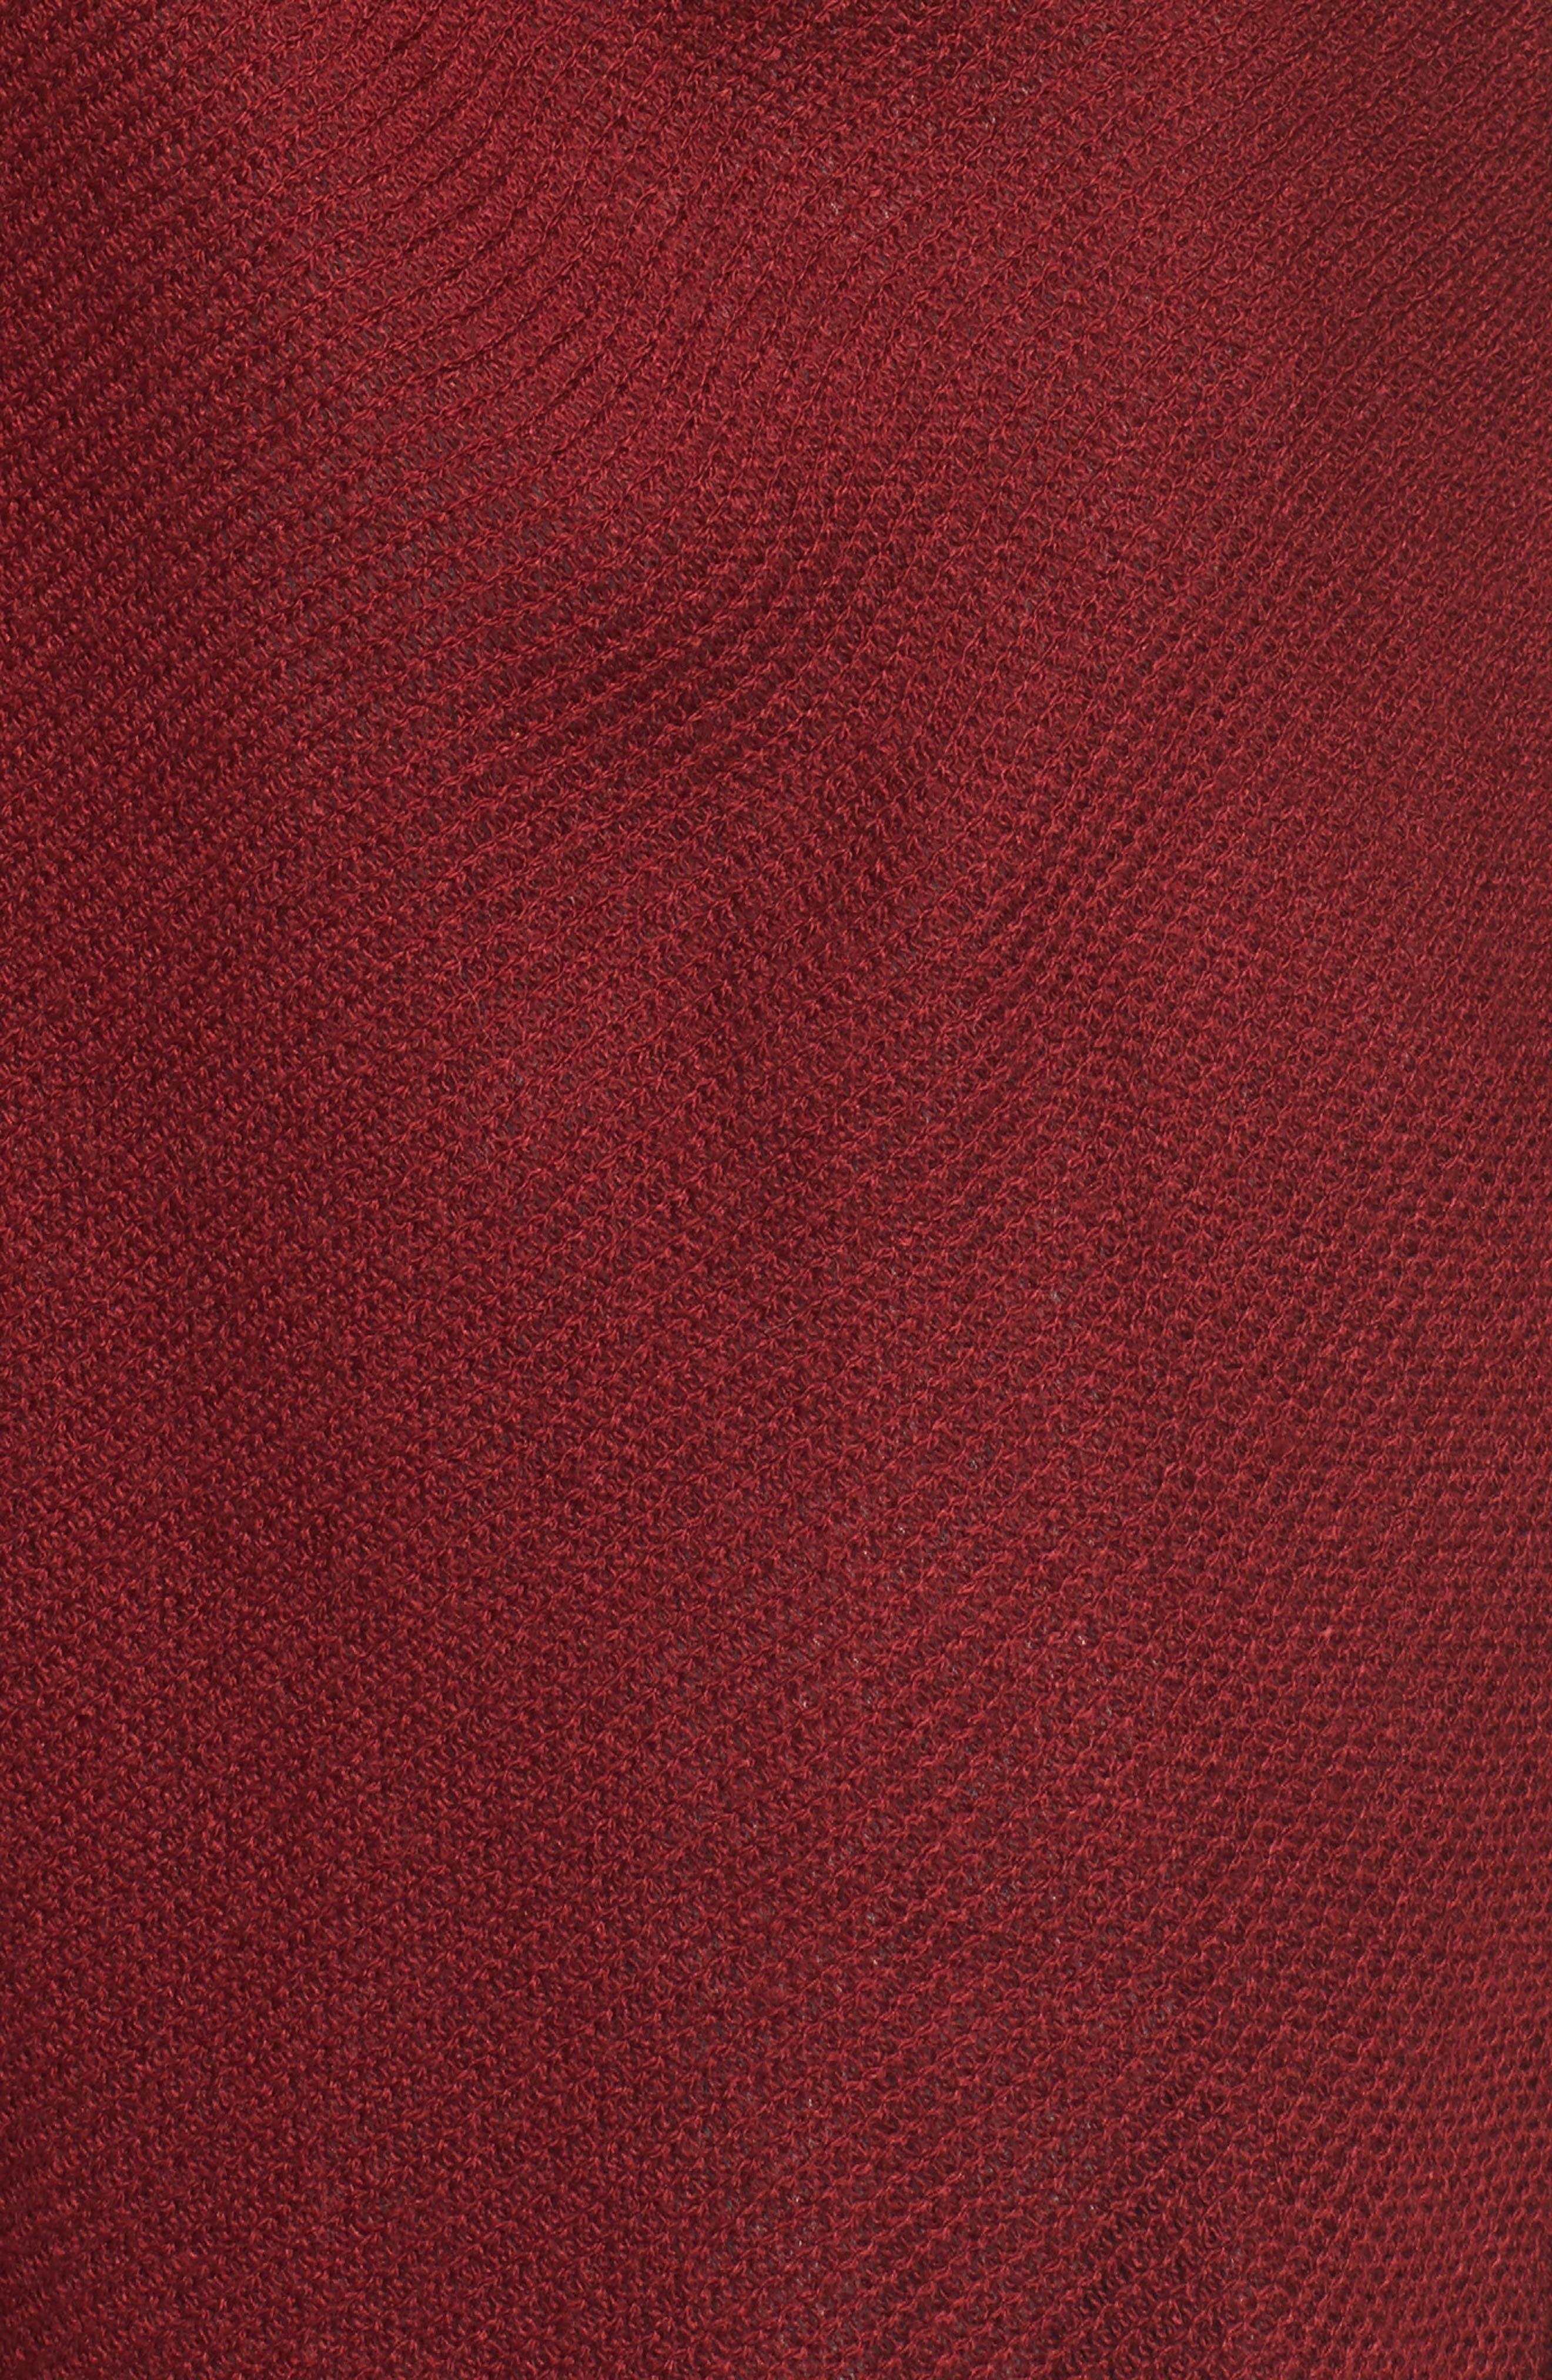 Chevron Cardigan,                             Alternate thumbnail 5, color,                             Burgundy